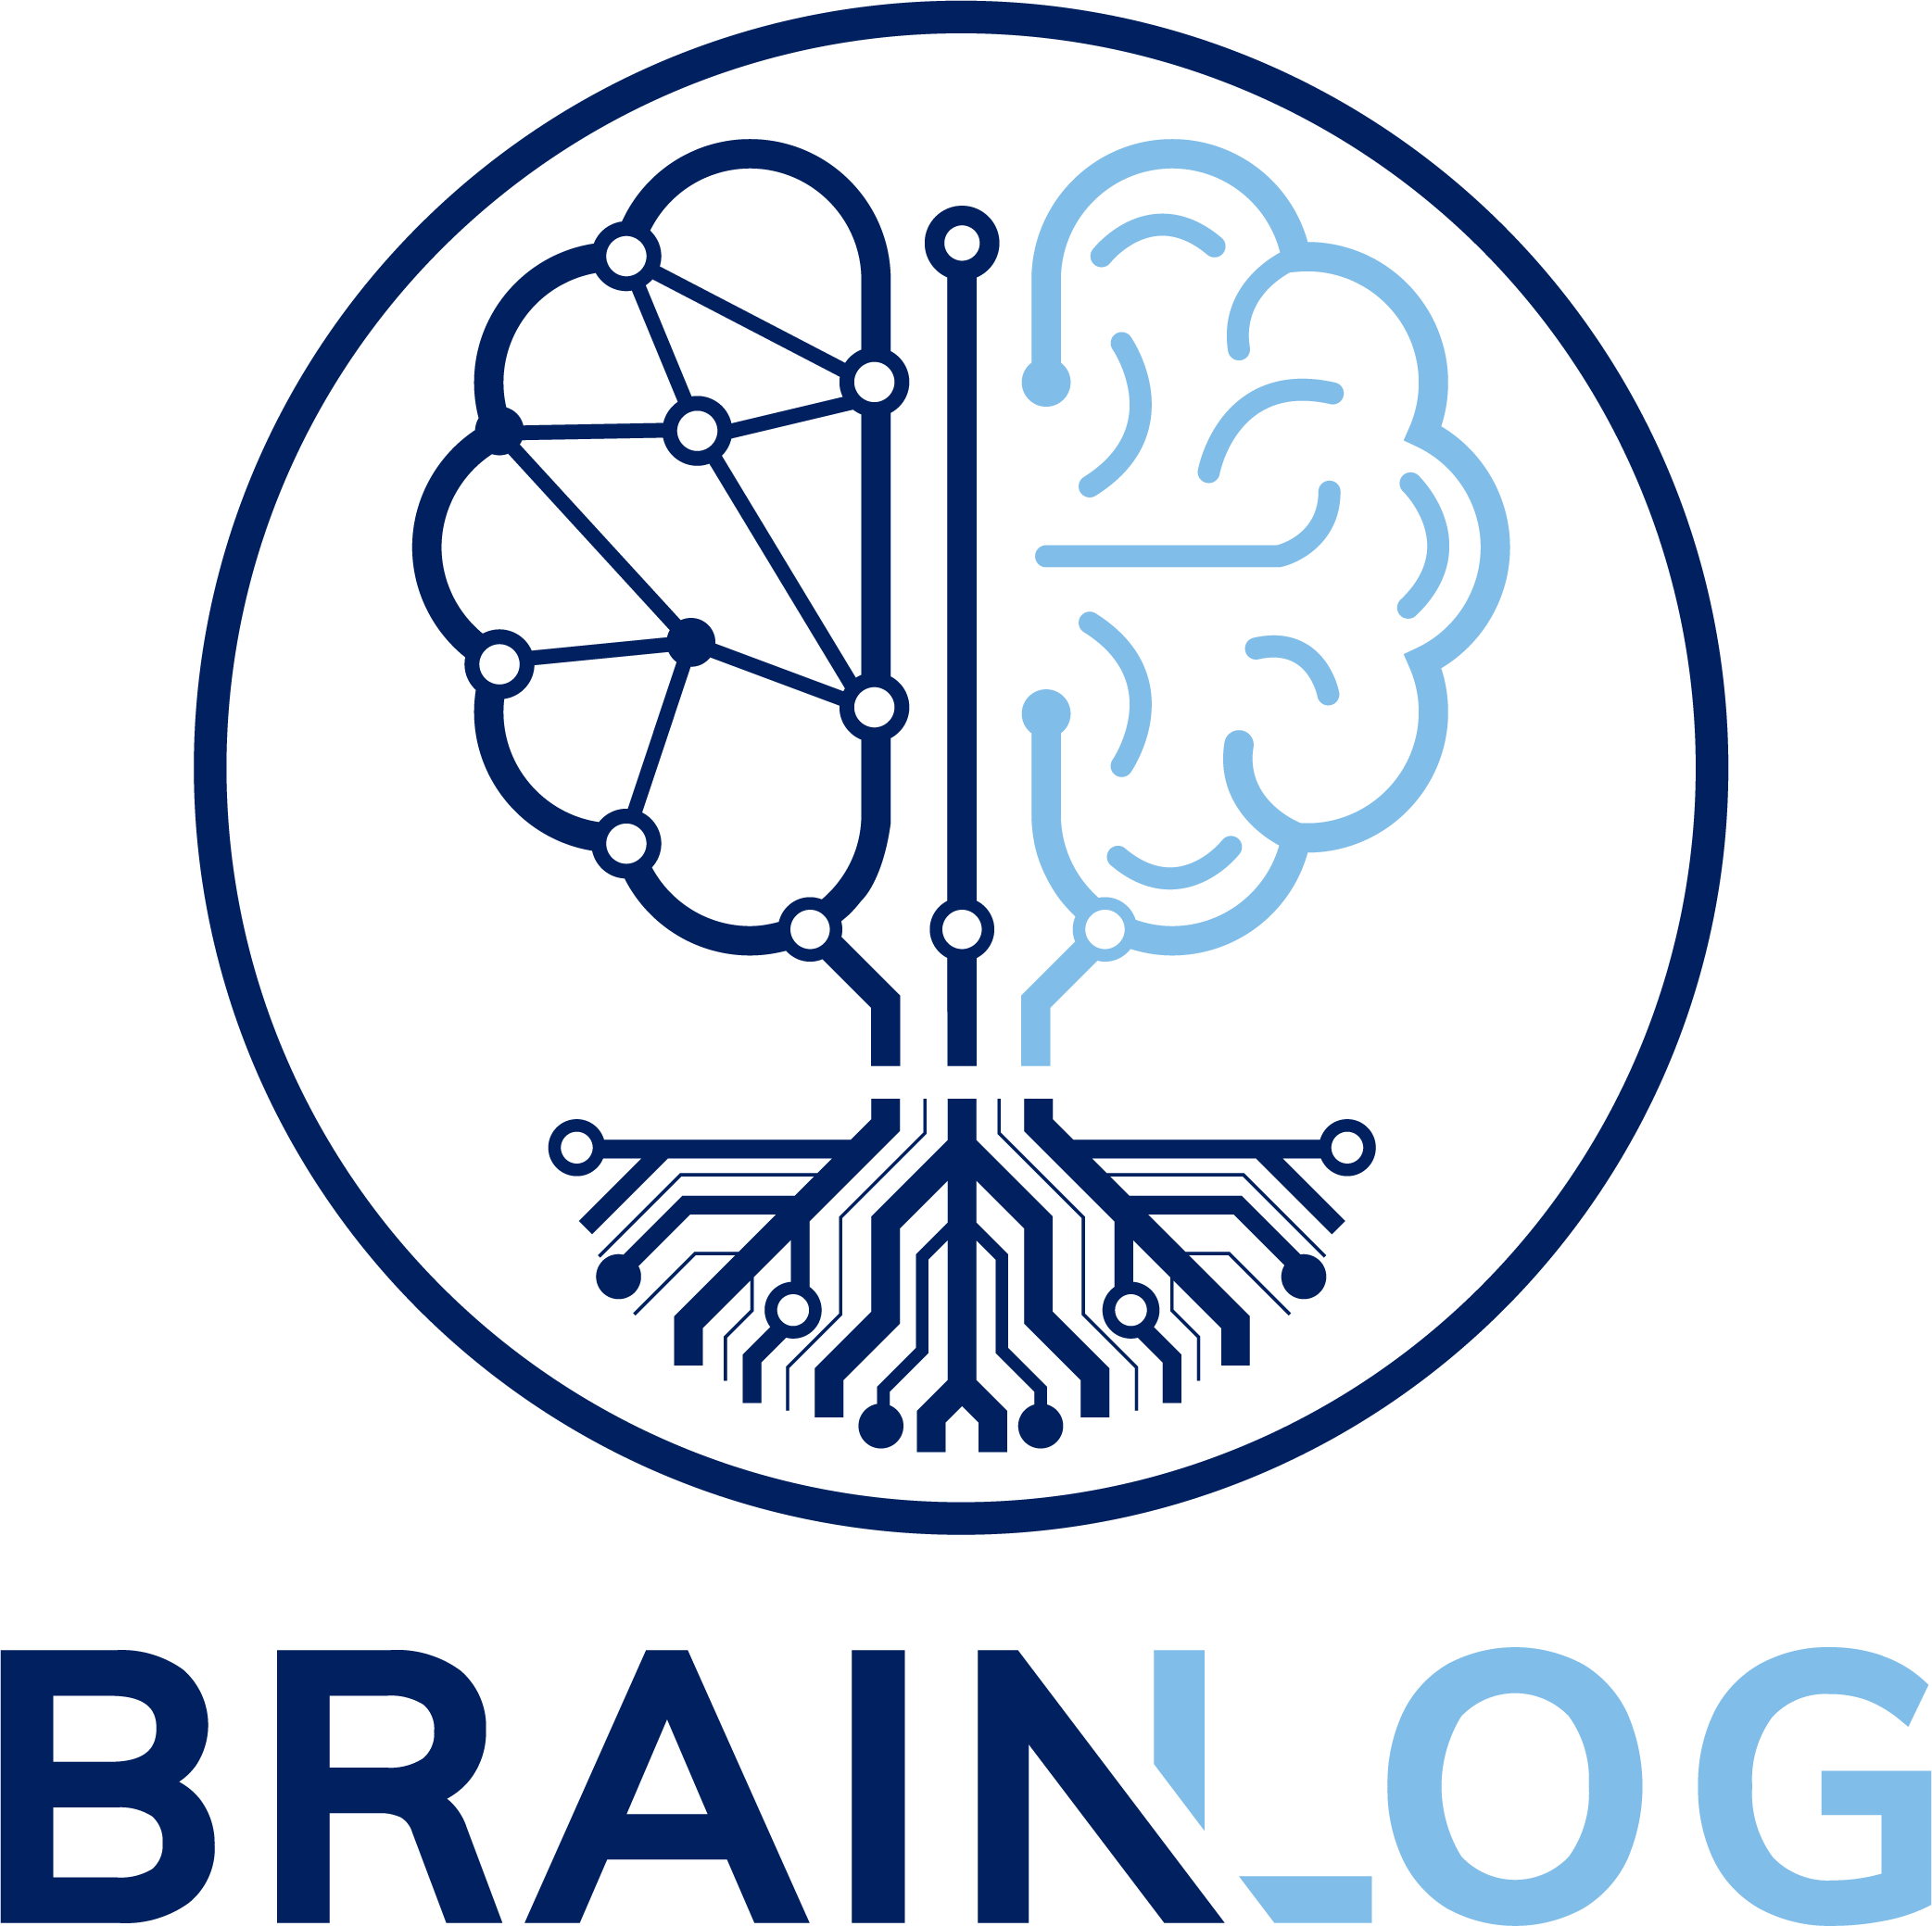 Brainlog logo